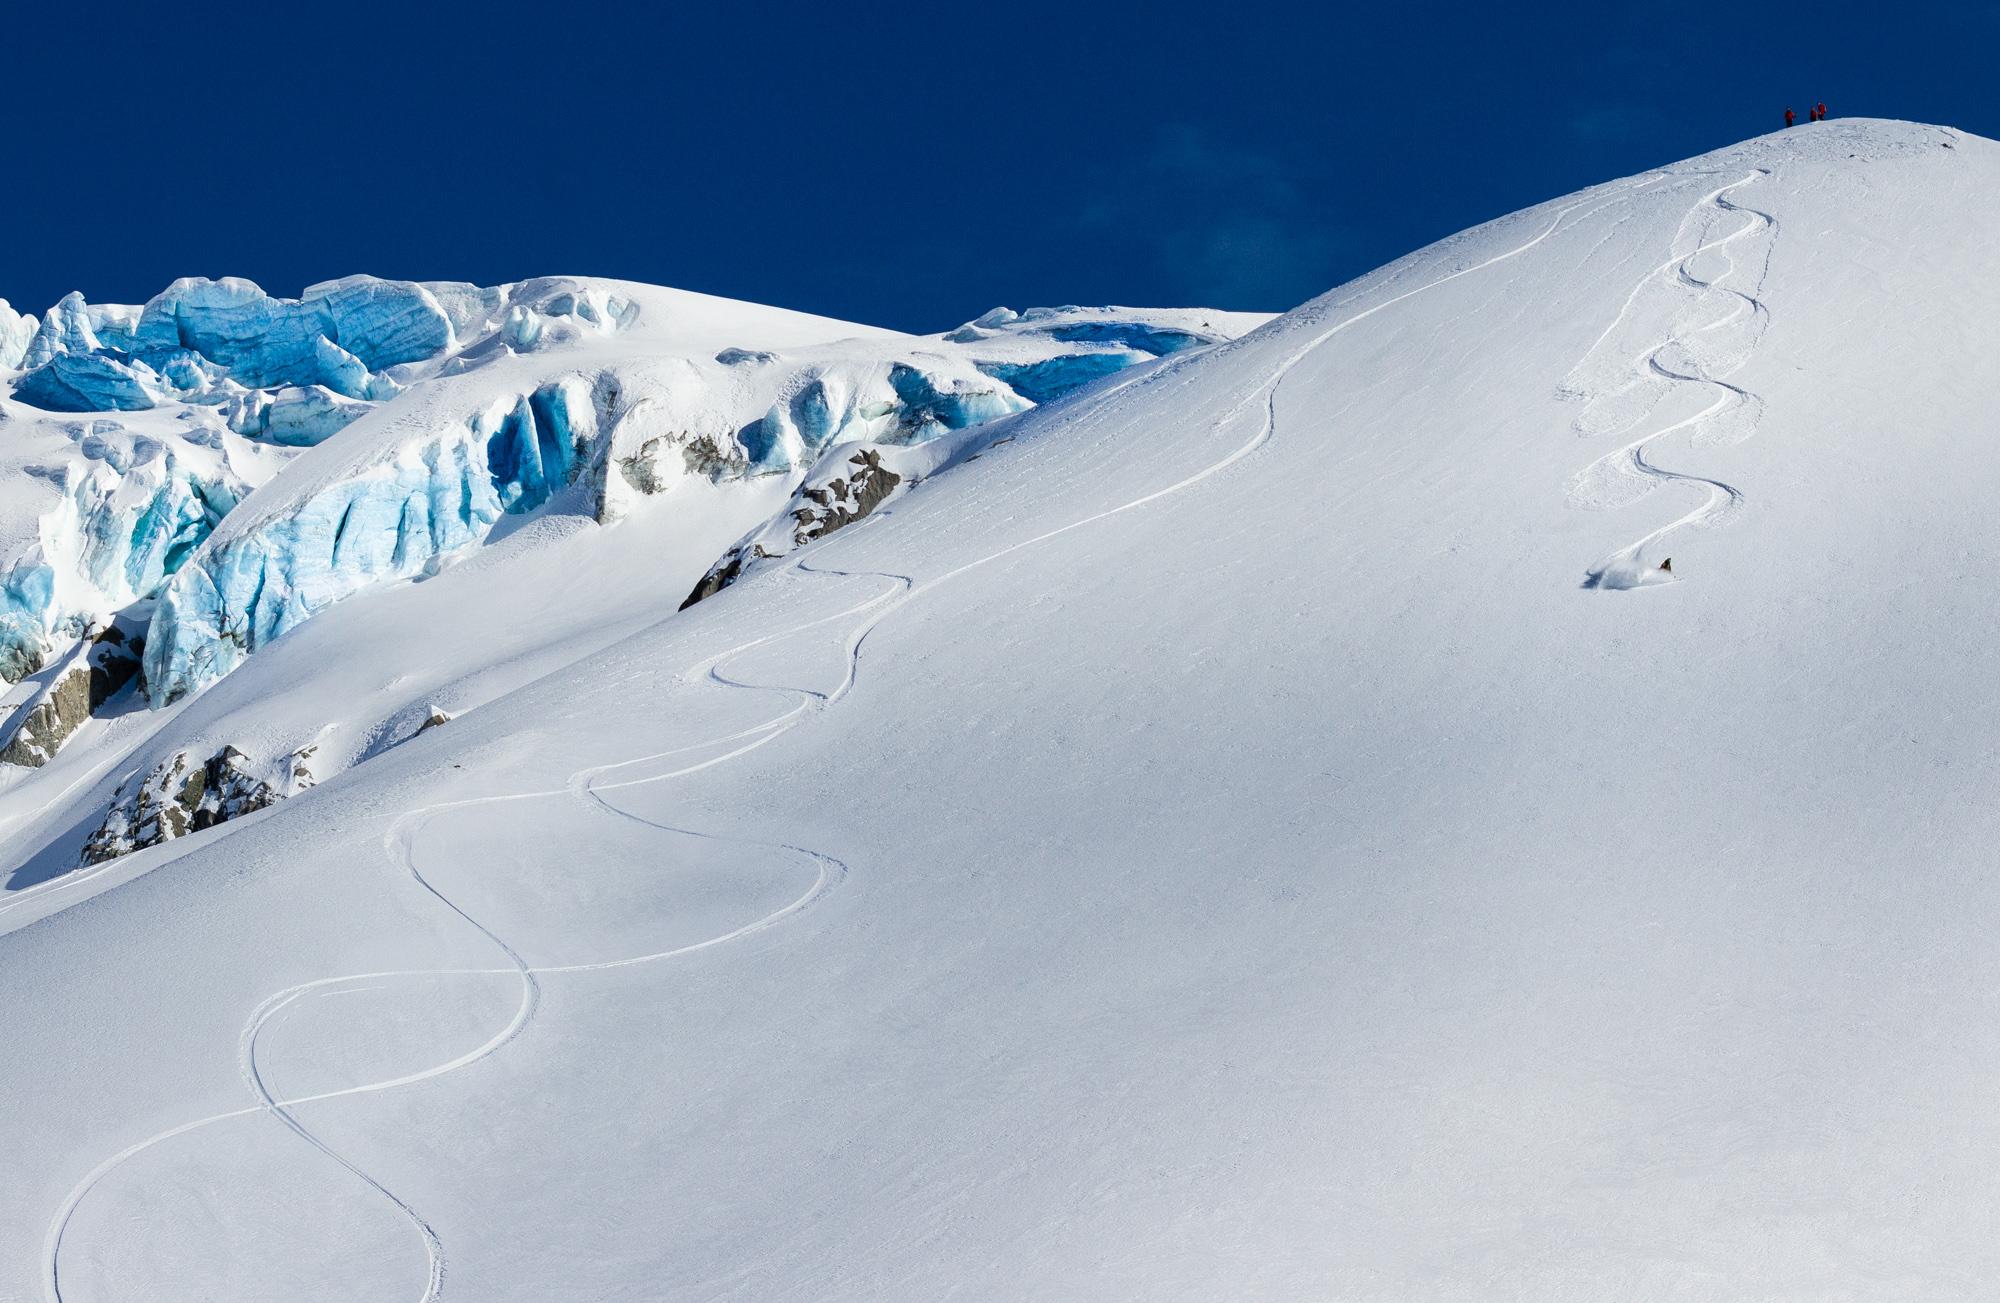 Photo: Justin McCarty Skier: Dave Kaiser